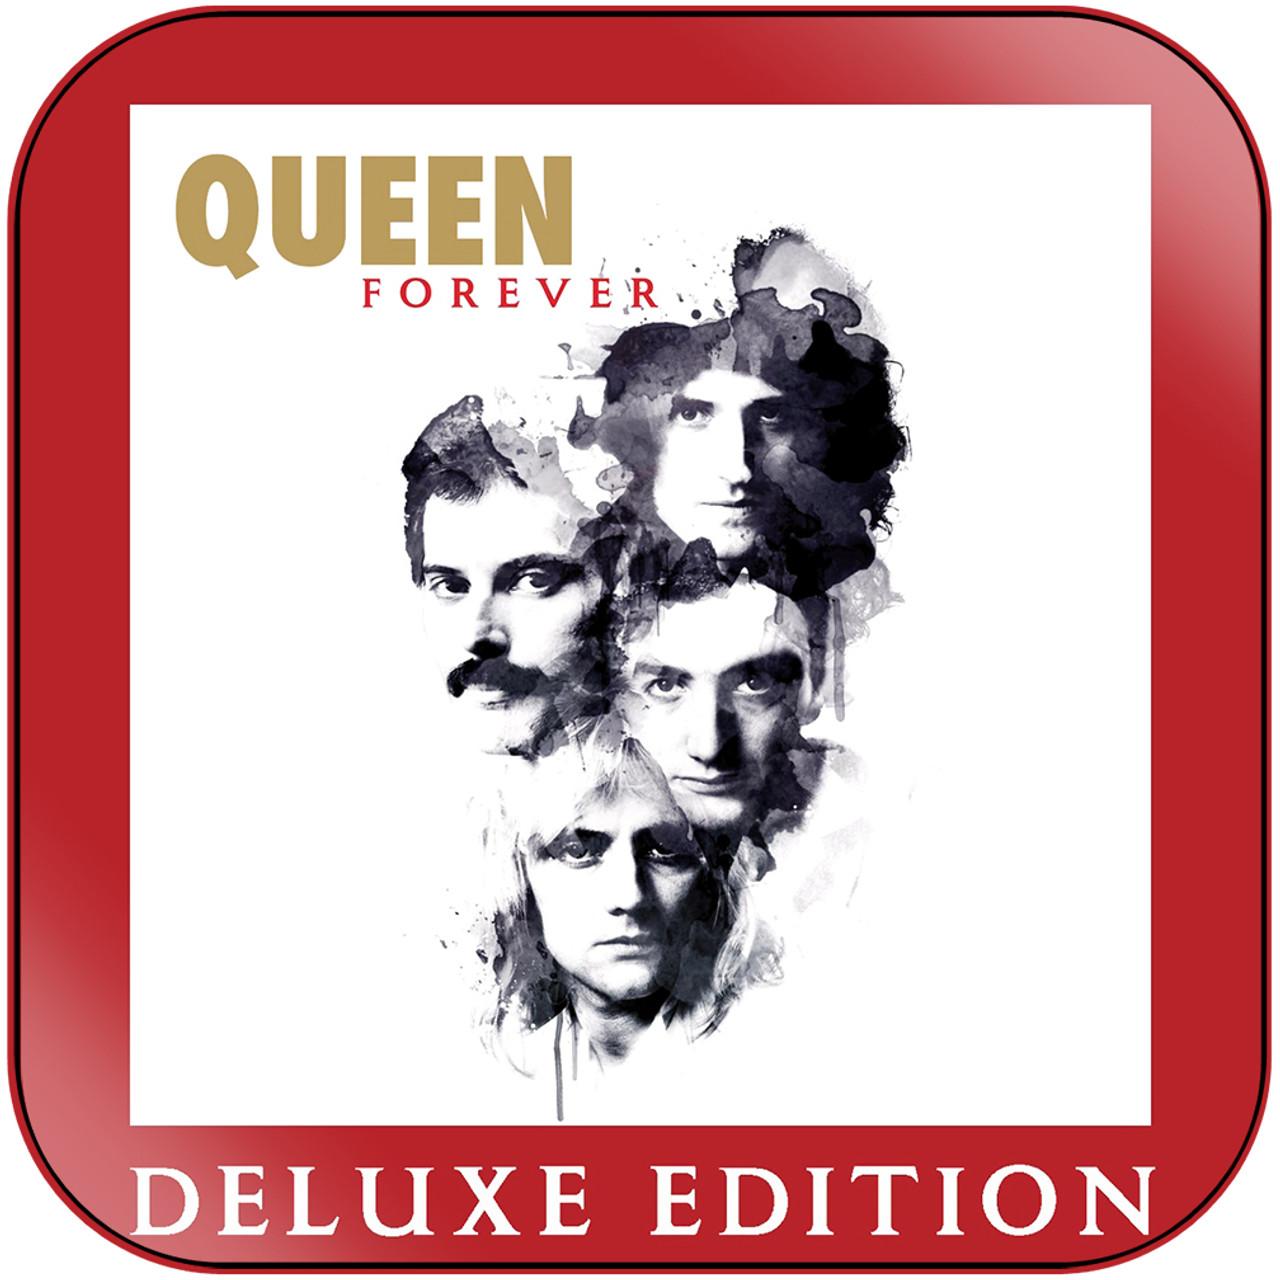 Queen - Queen Forever 1 Album Cover Sticker Album Cover Sticker